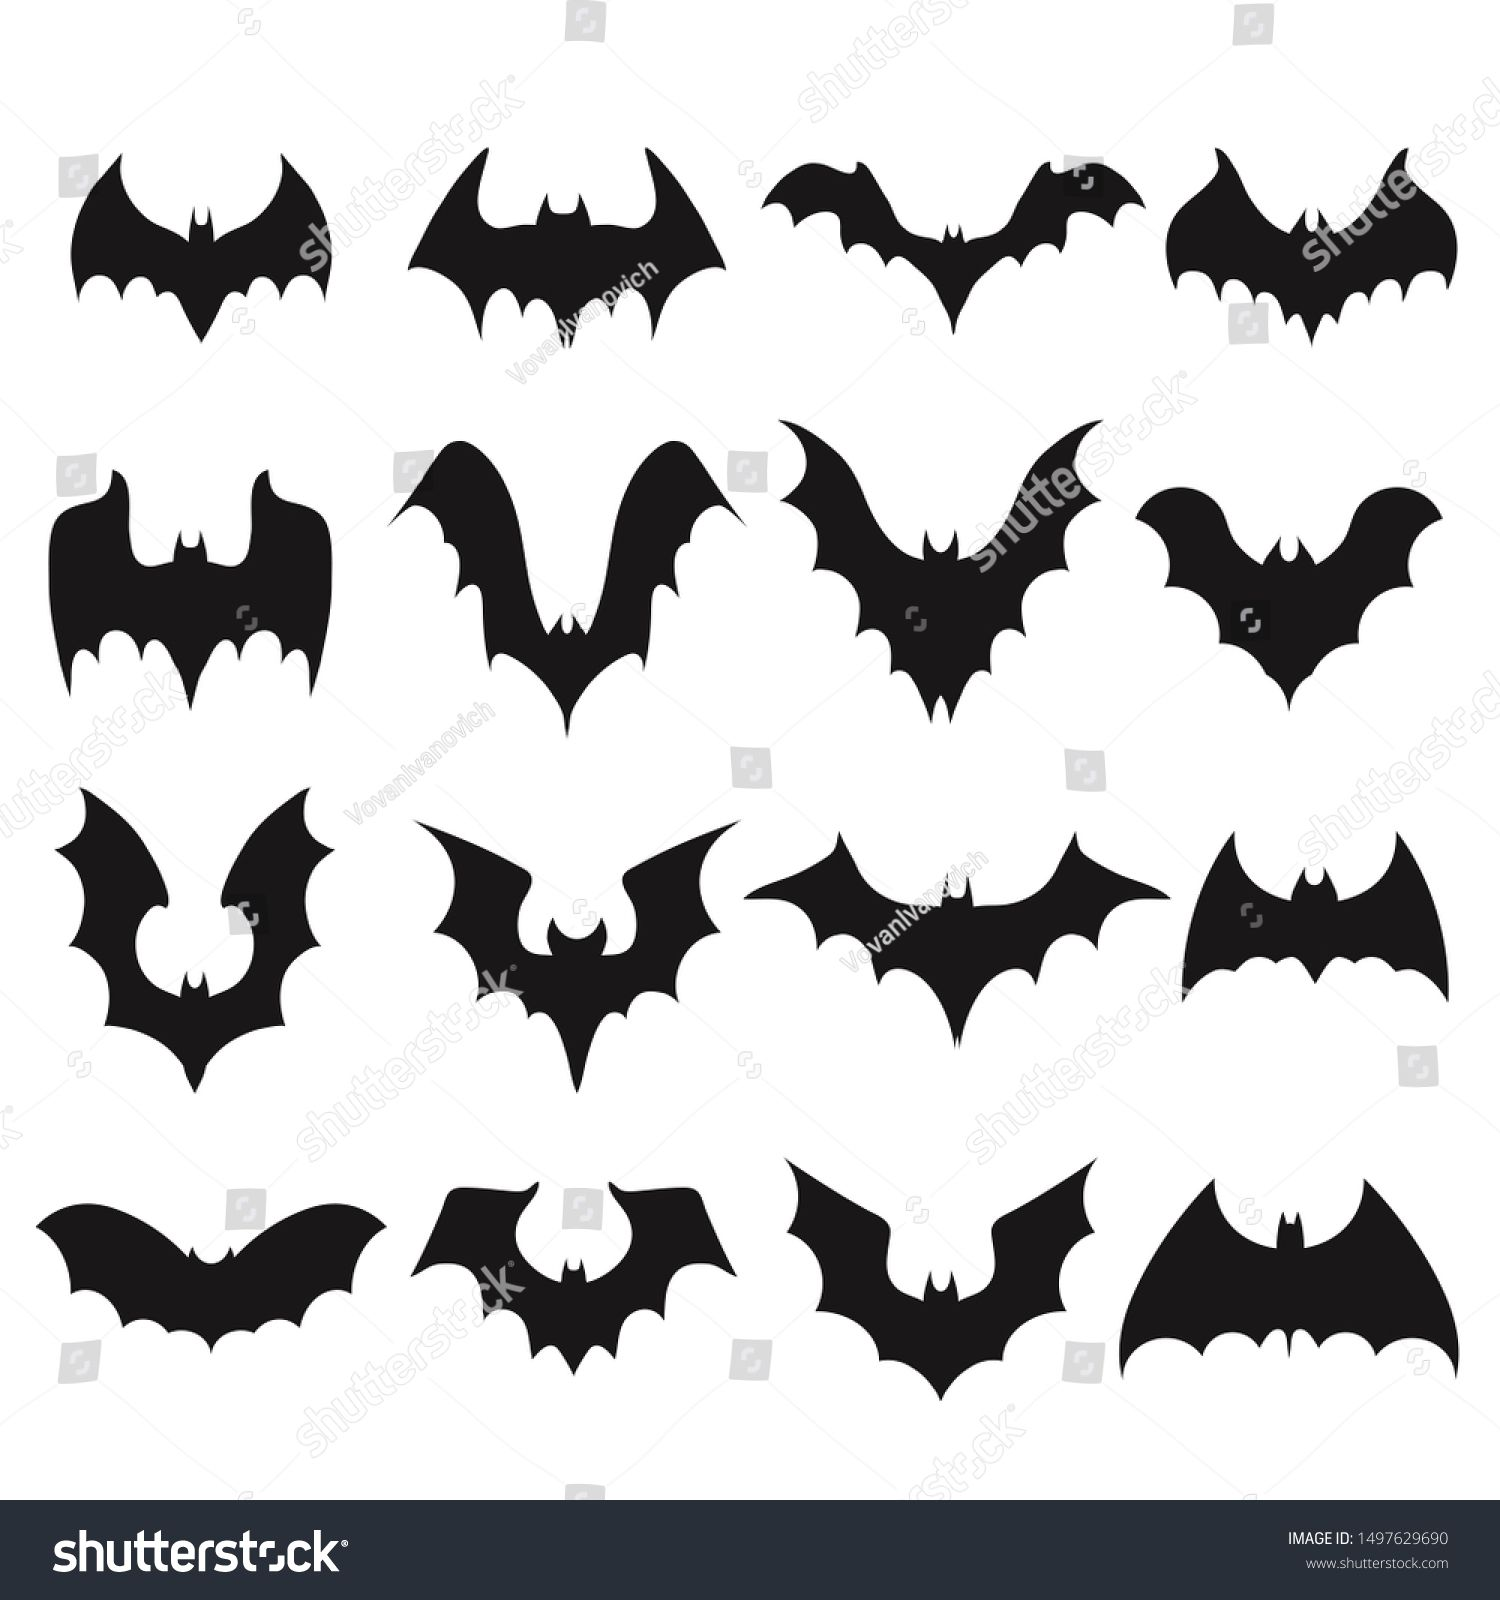 Vintage Bat Drawing Google Search Bat Art Drawings Bat